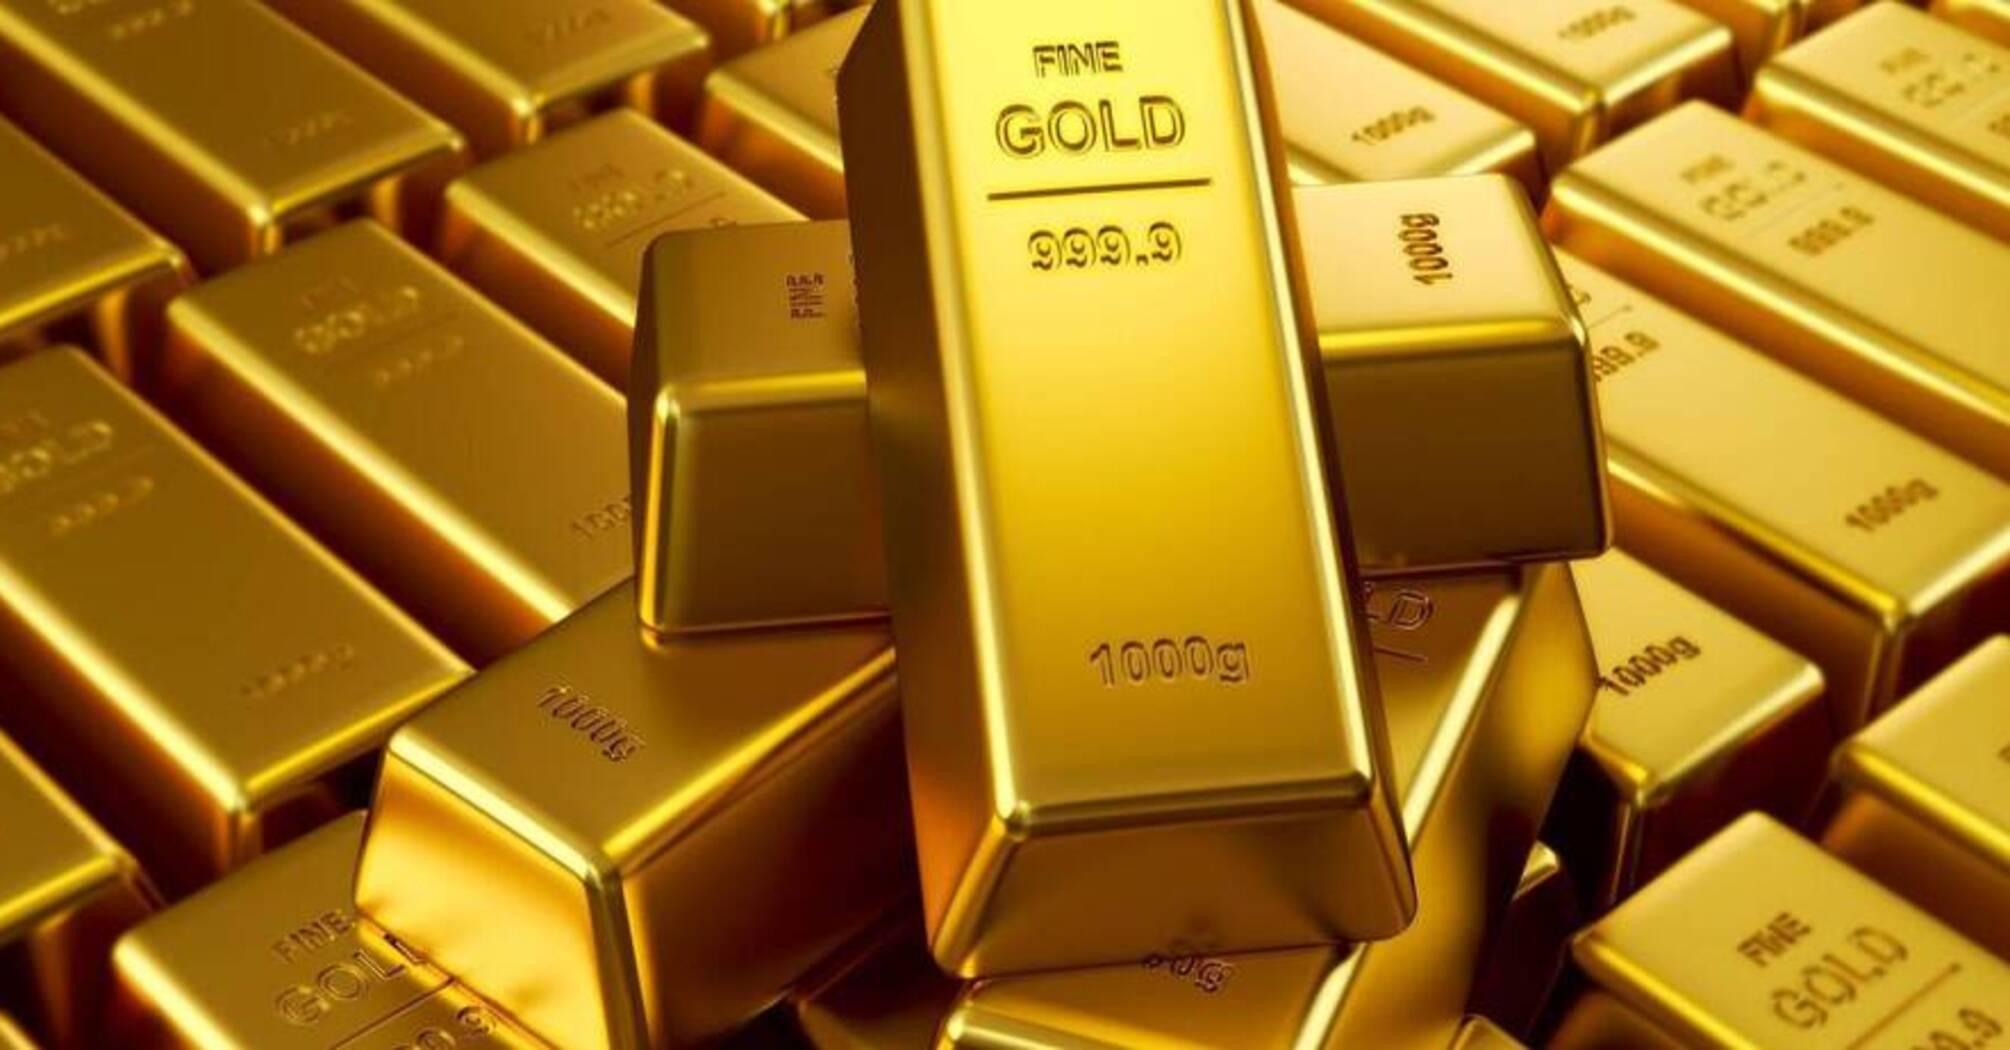 Цены на золото поднялись до максимума с 2011 года